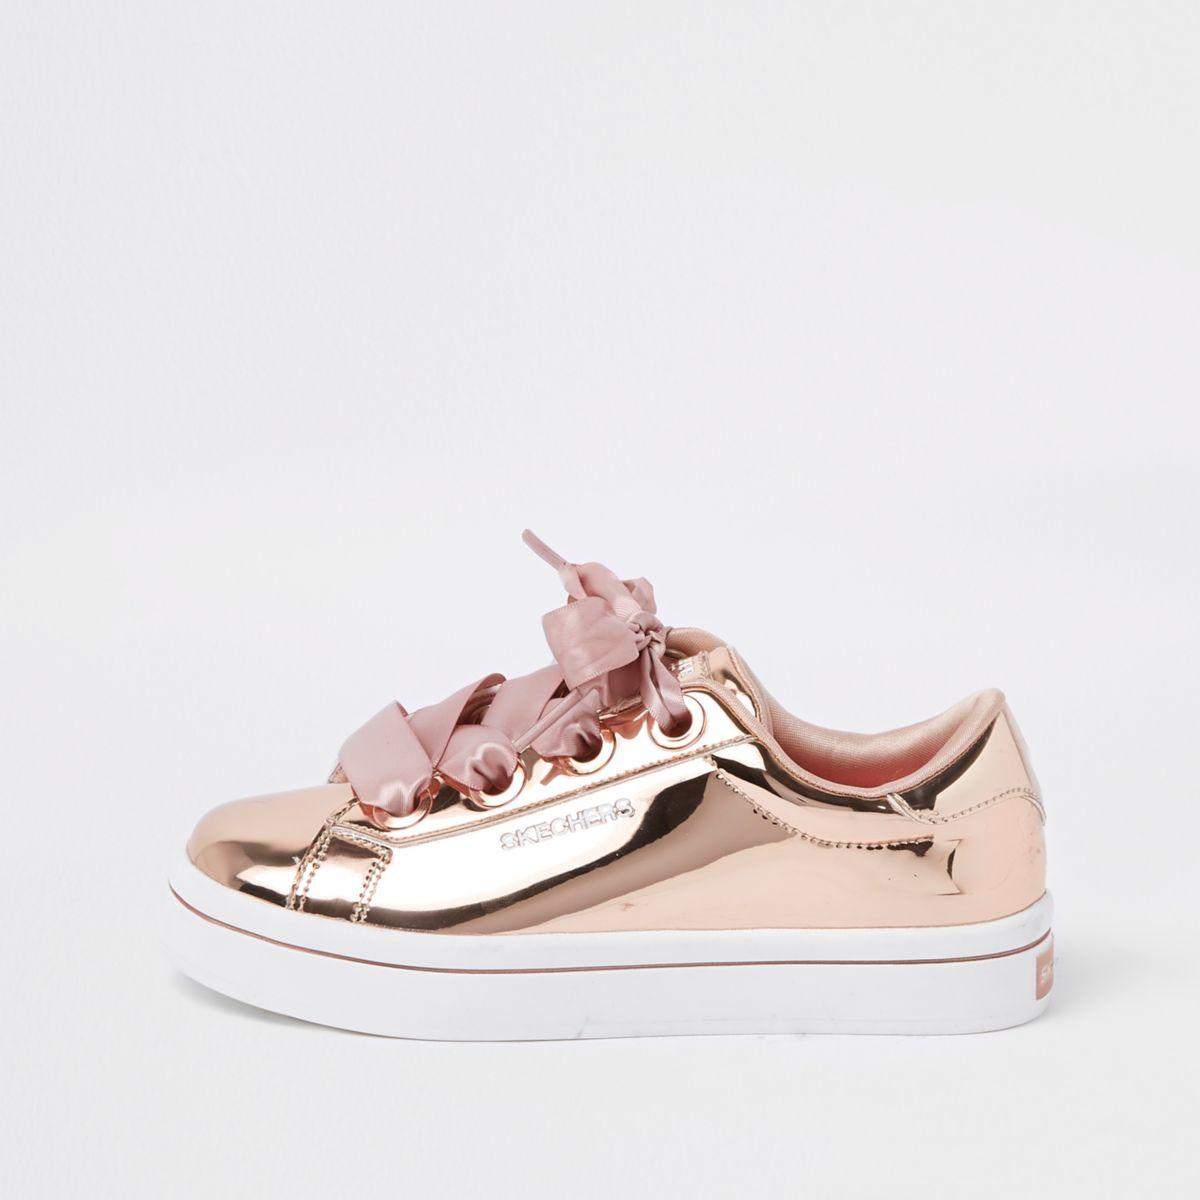 Girls Skechers rose gold low top sneakers